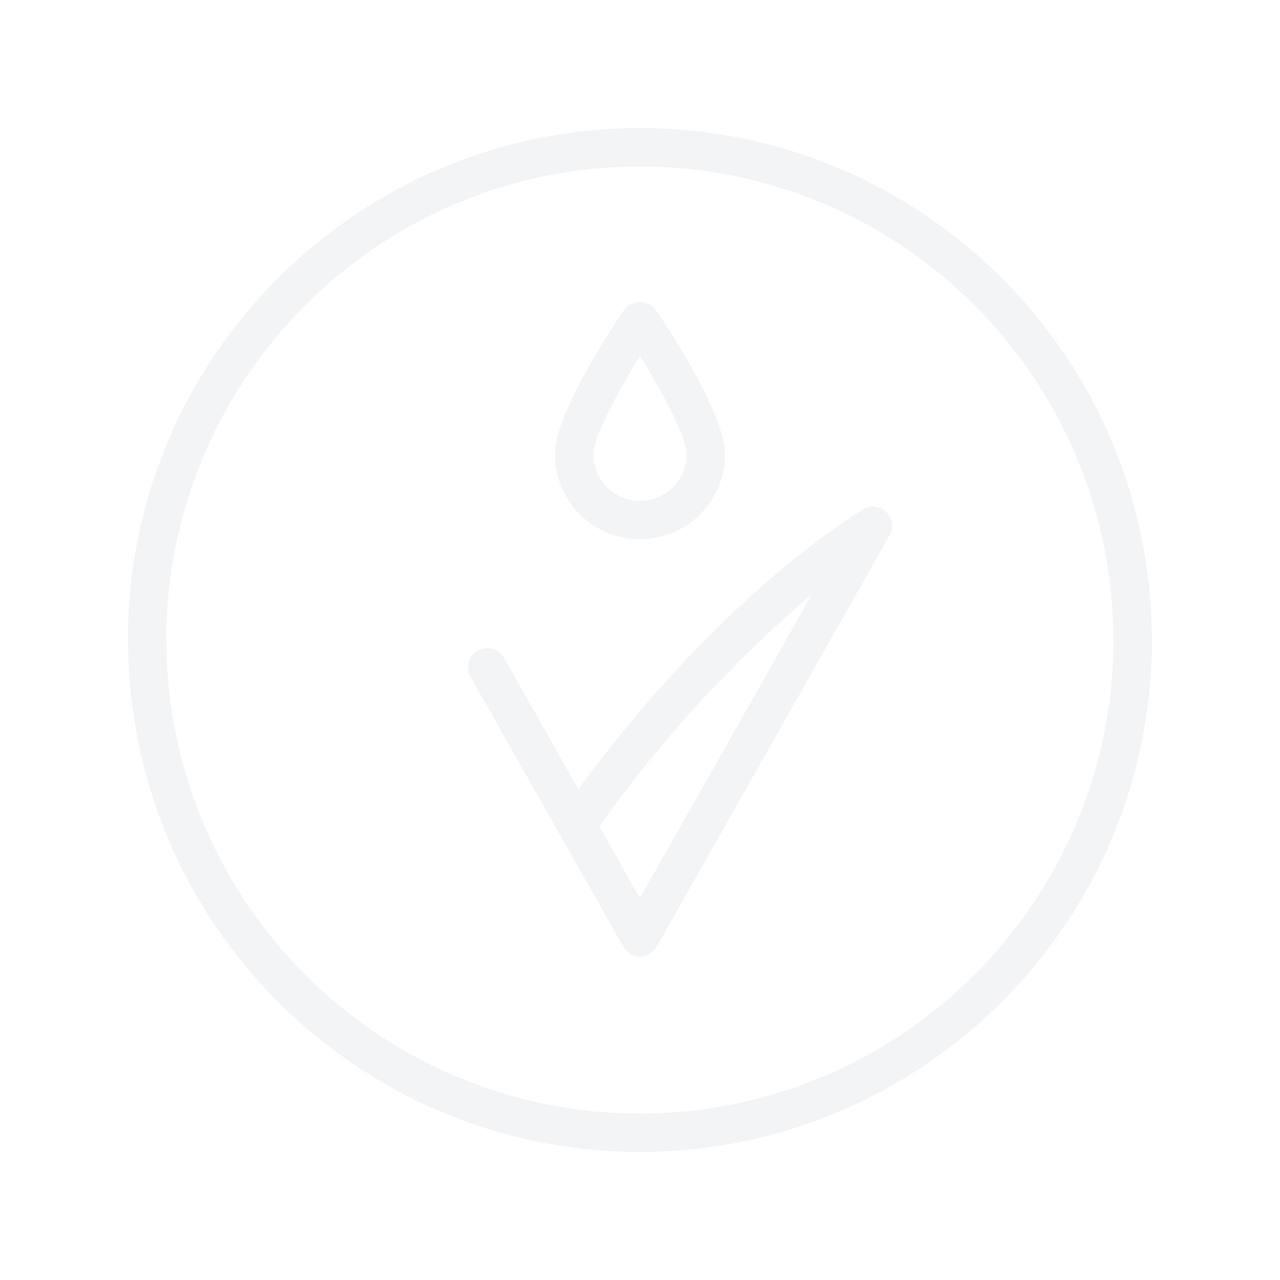 L'OREAL True Match Highlight Powder 9g